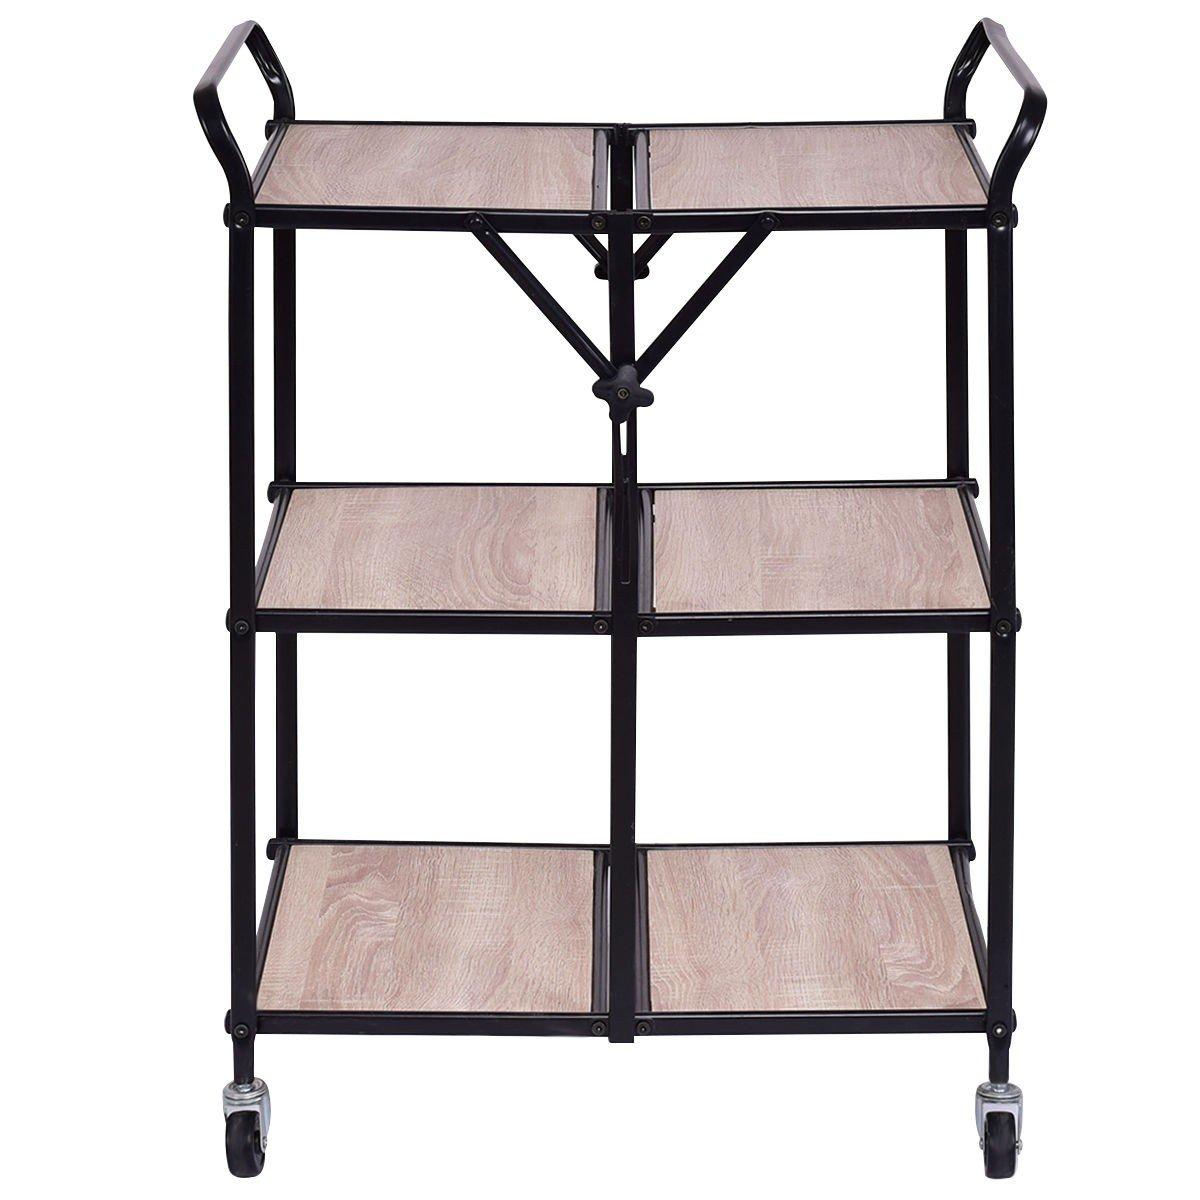 3-Tier Kitchen Folding Storage Shelves Rolling Trolley Organizer Serving Us Portable Durable CHOOSEandBUY